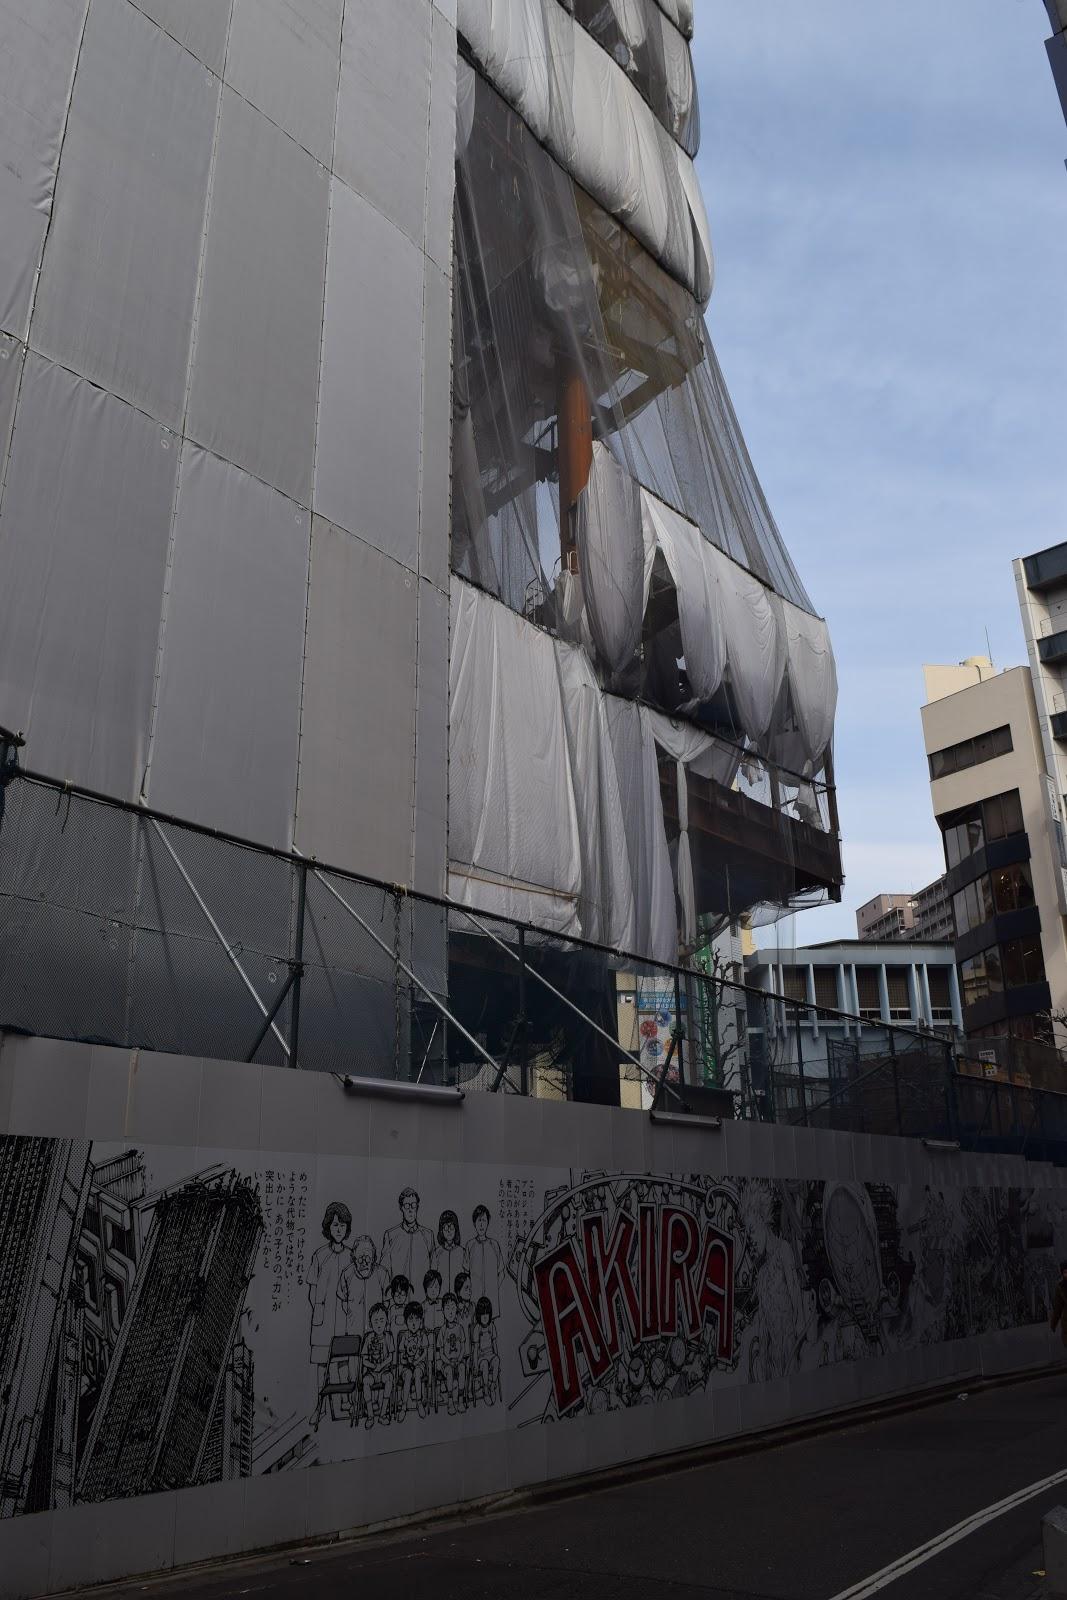 Akira art in Shibuya